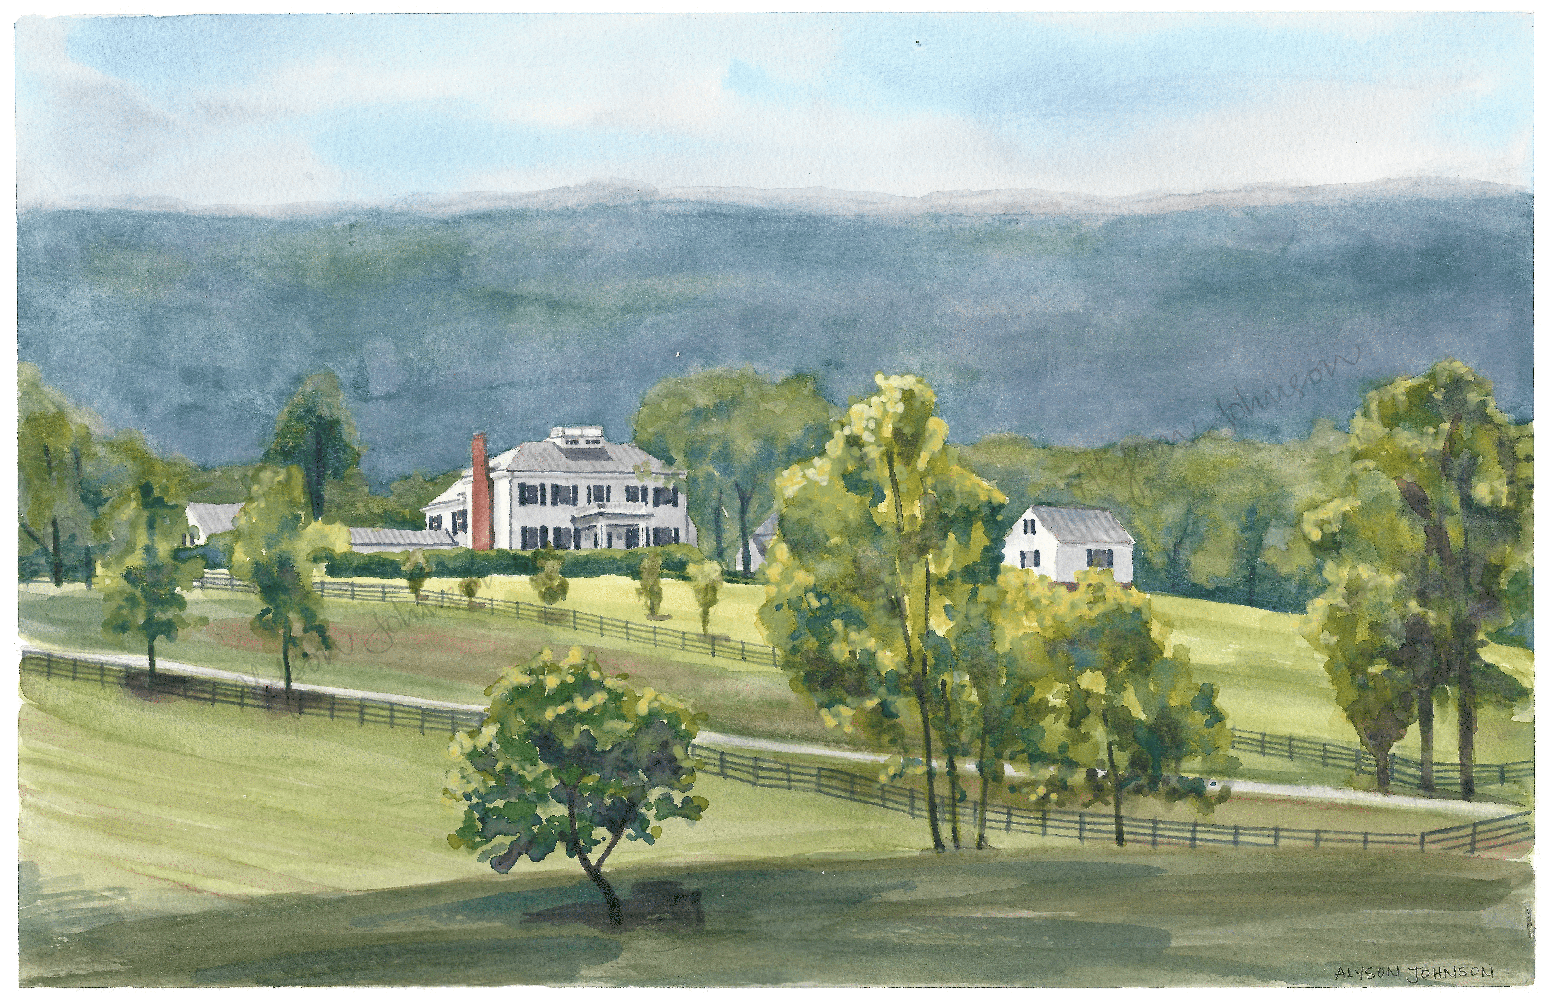 Mount Fair Farm